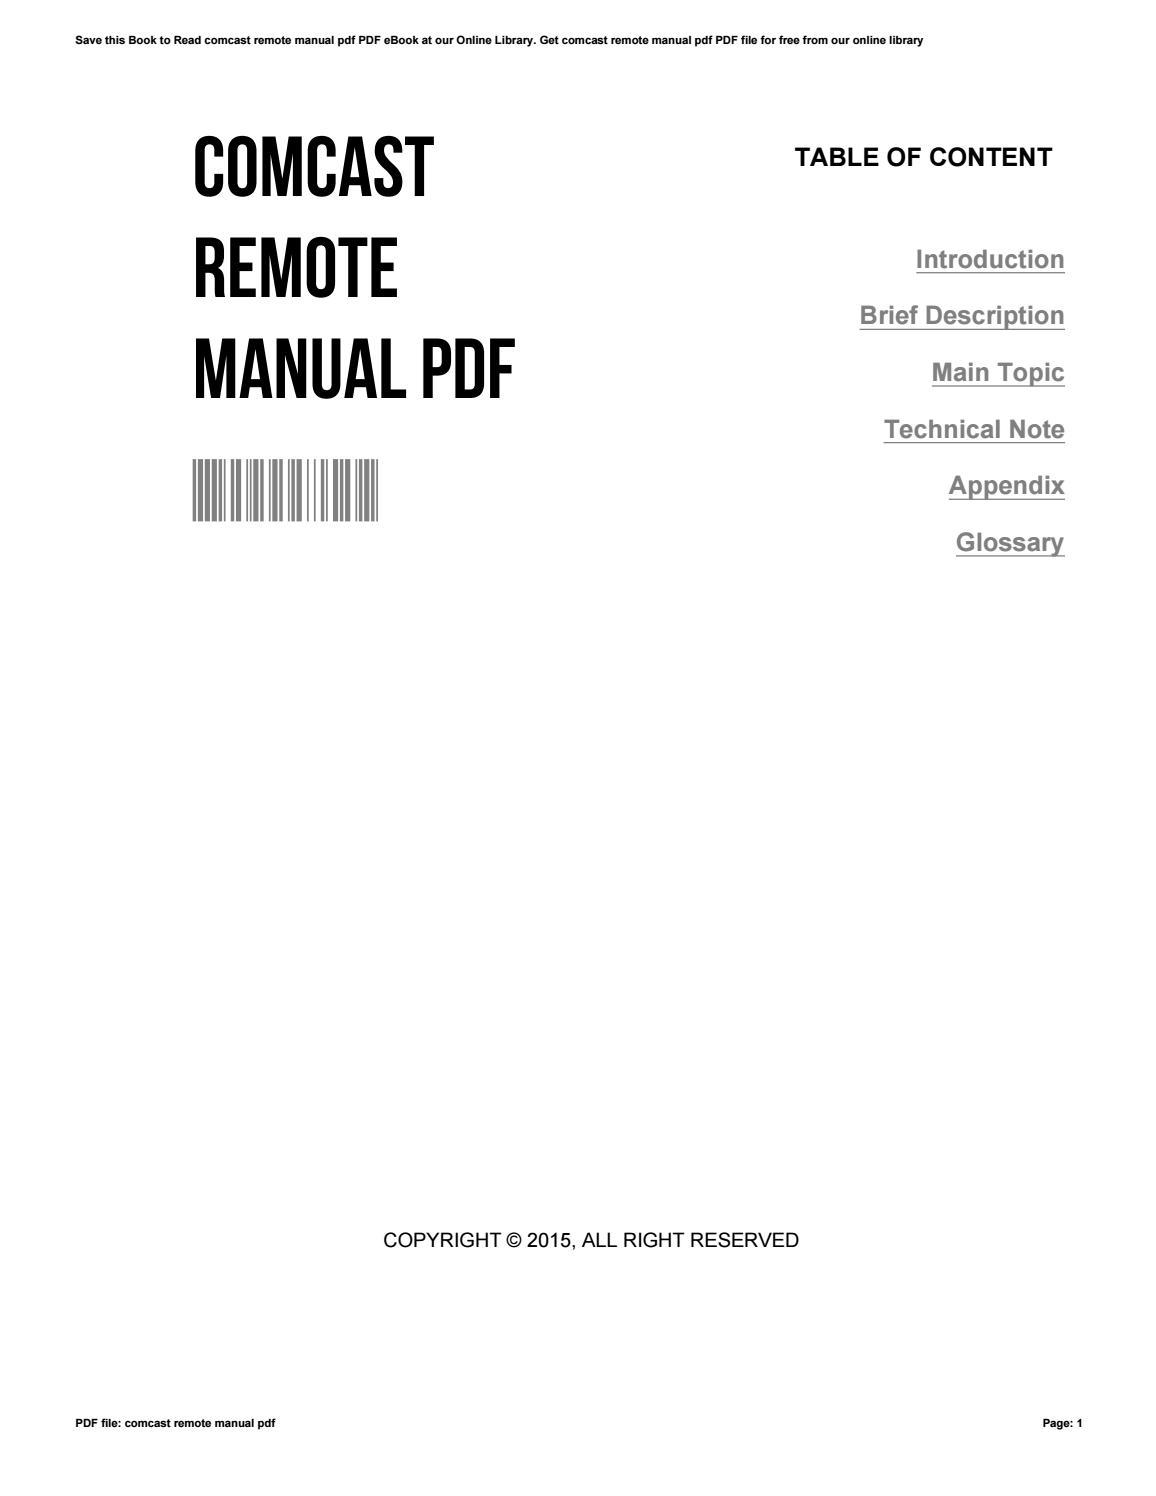 comcast remote manual pdf by jasontierney2554